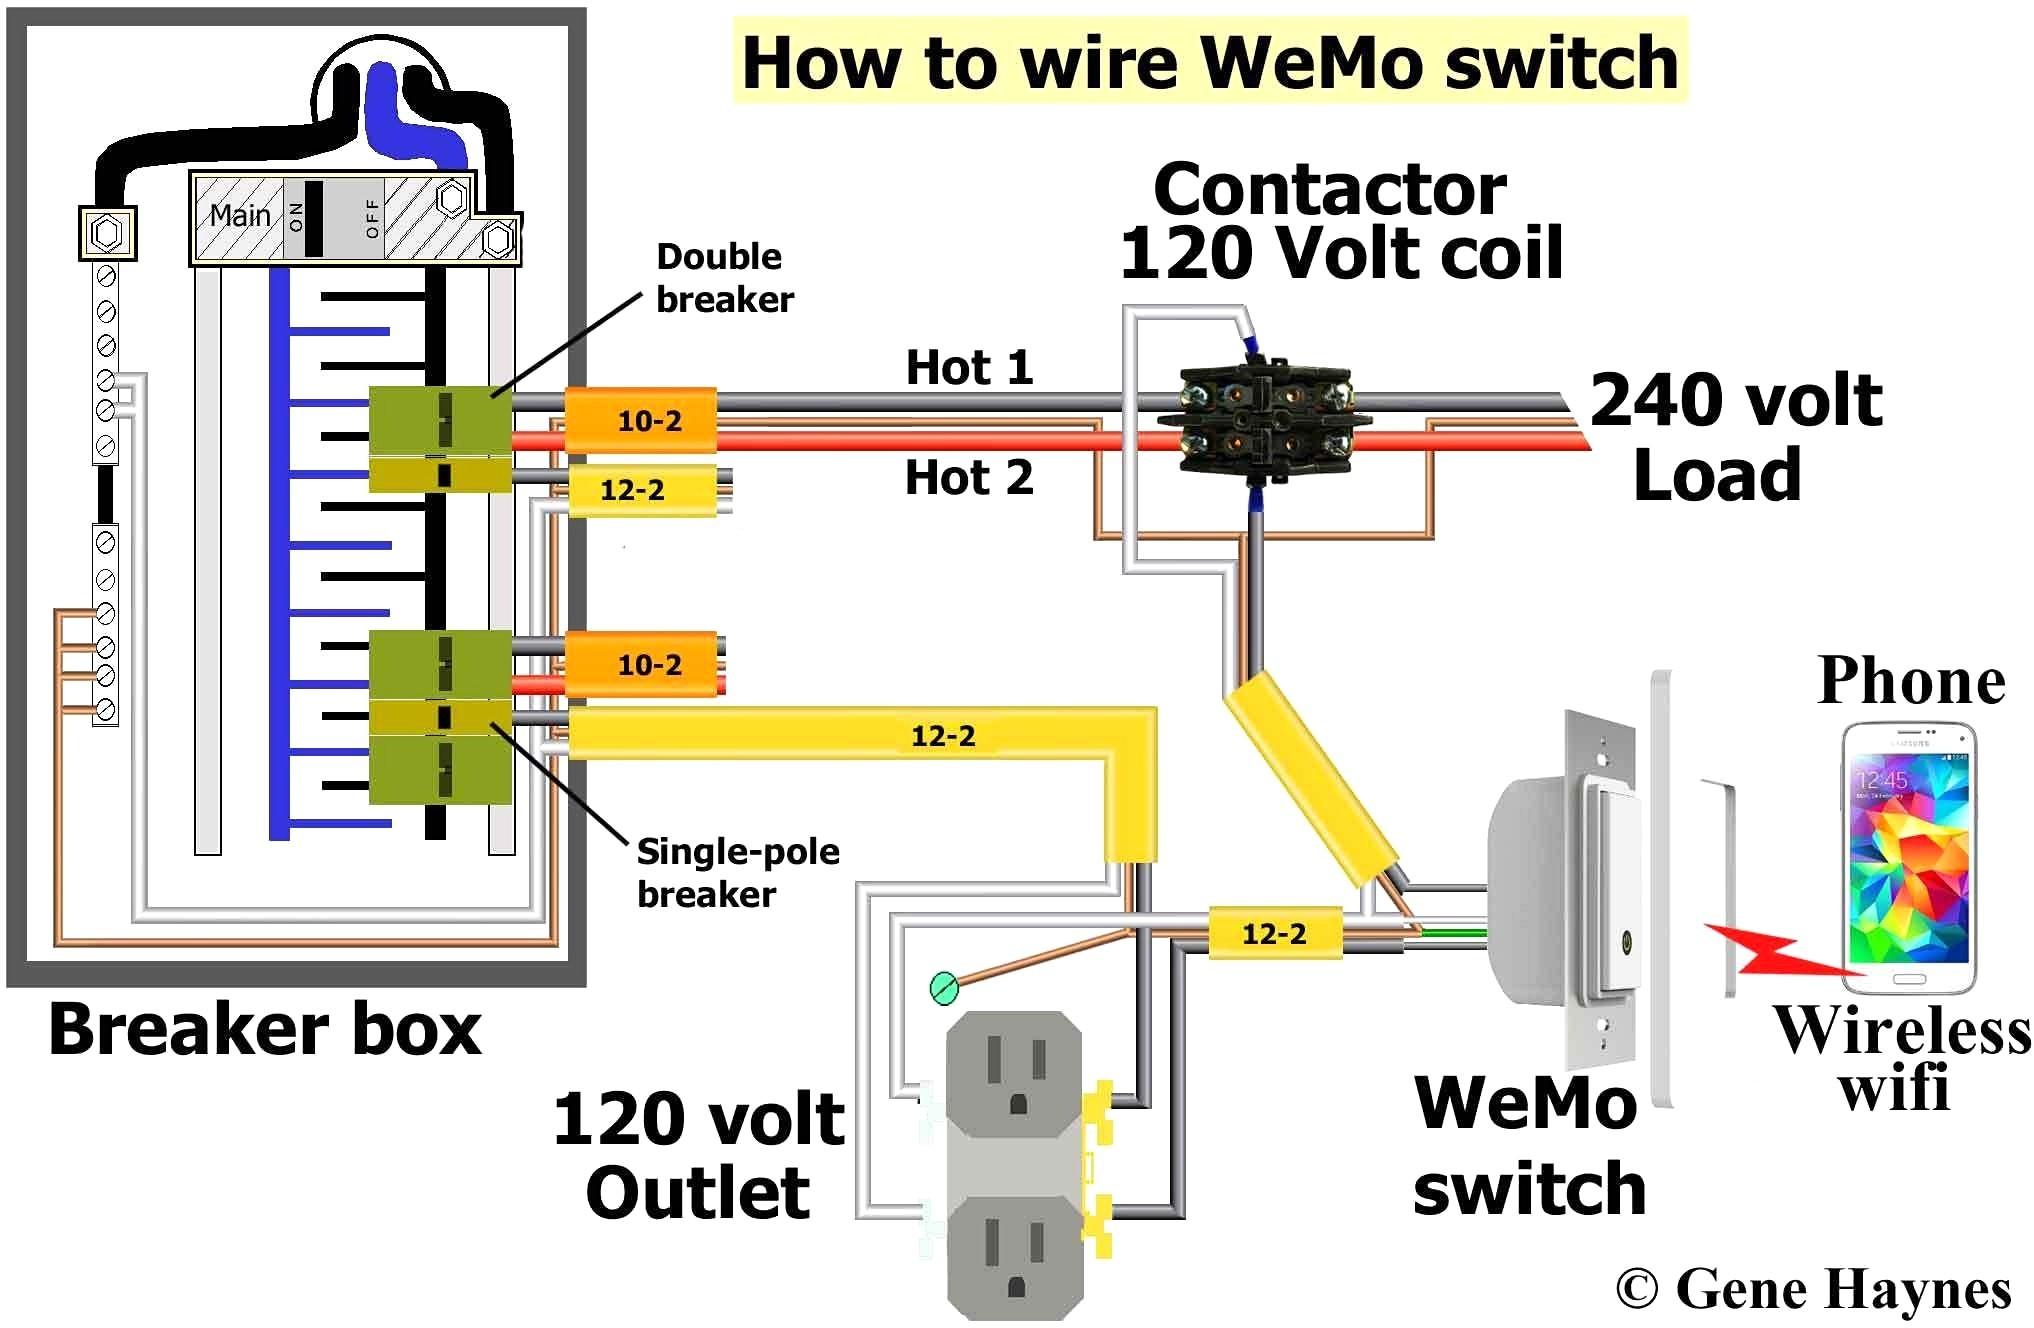 Cat5E Telephone Wiring Diagram - Allove - Telephone Wiring Diagram